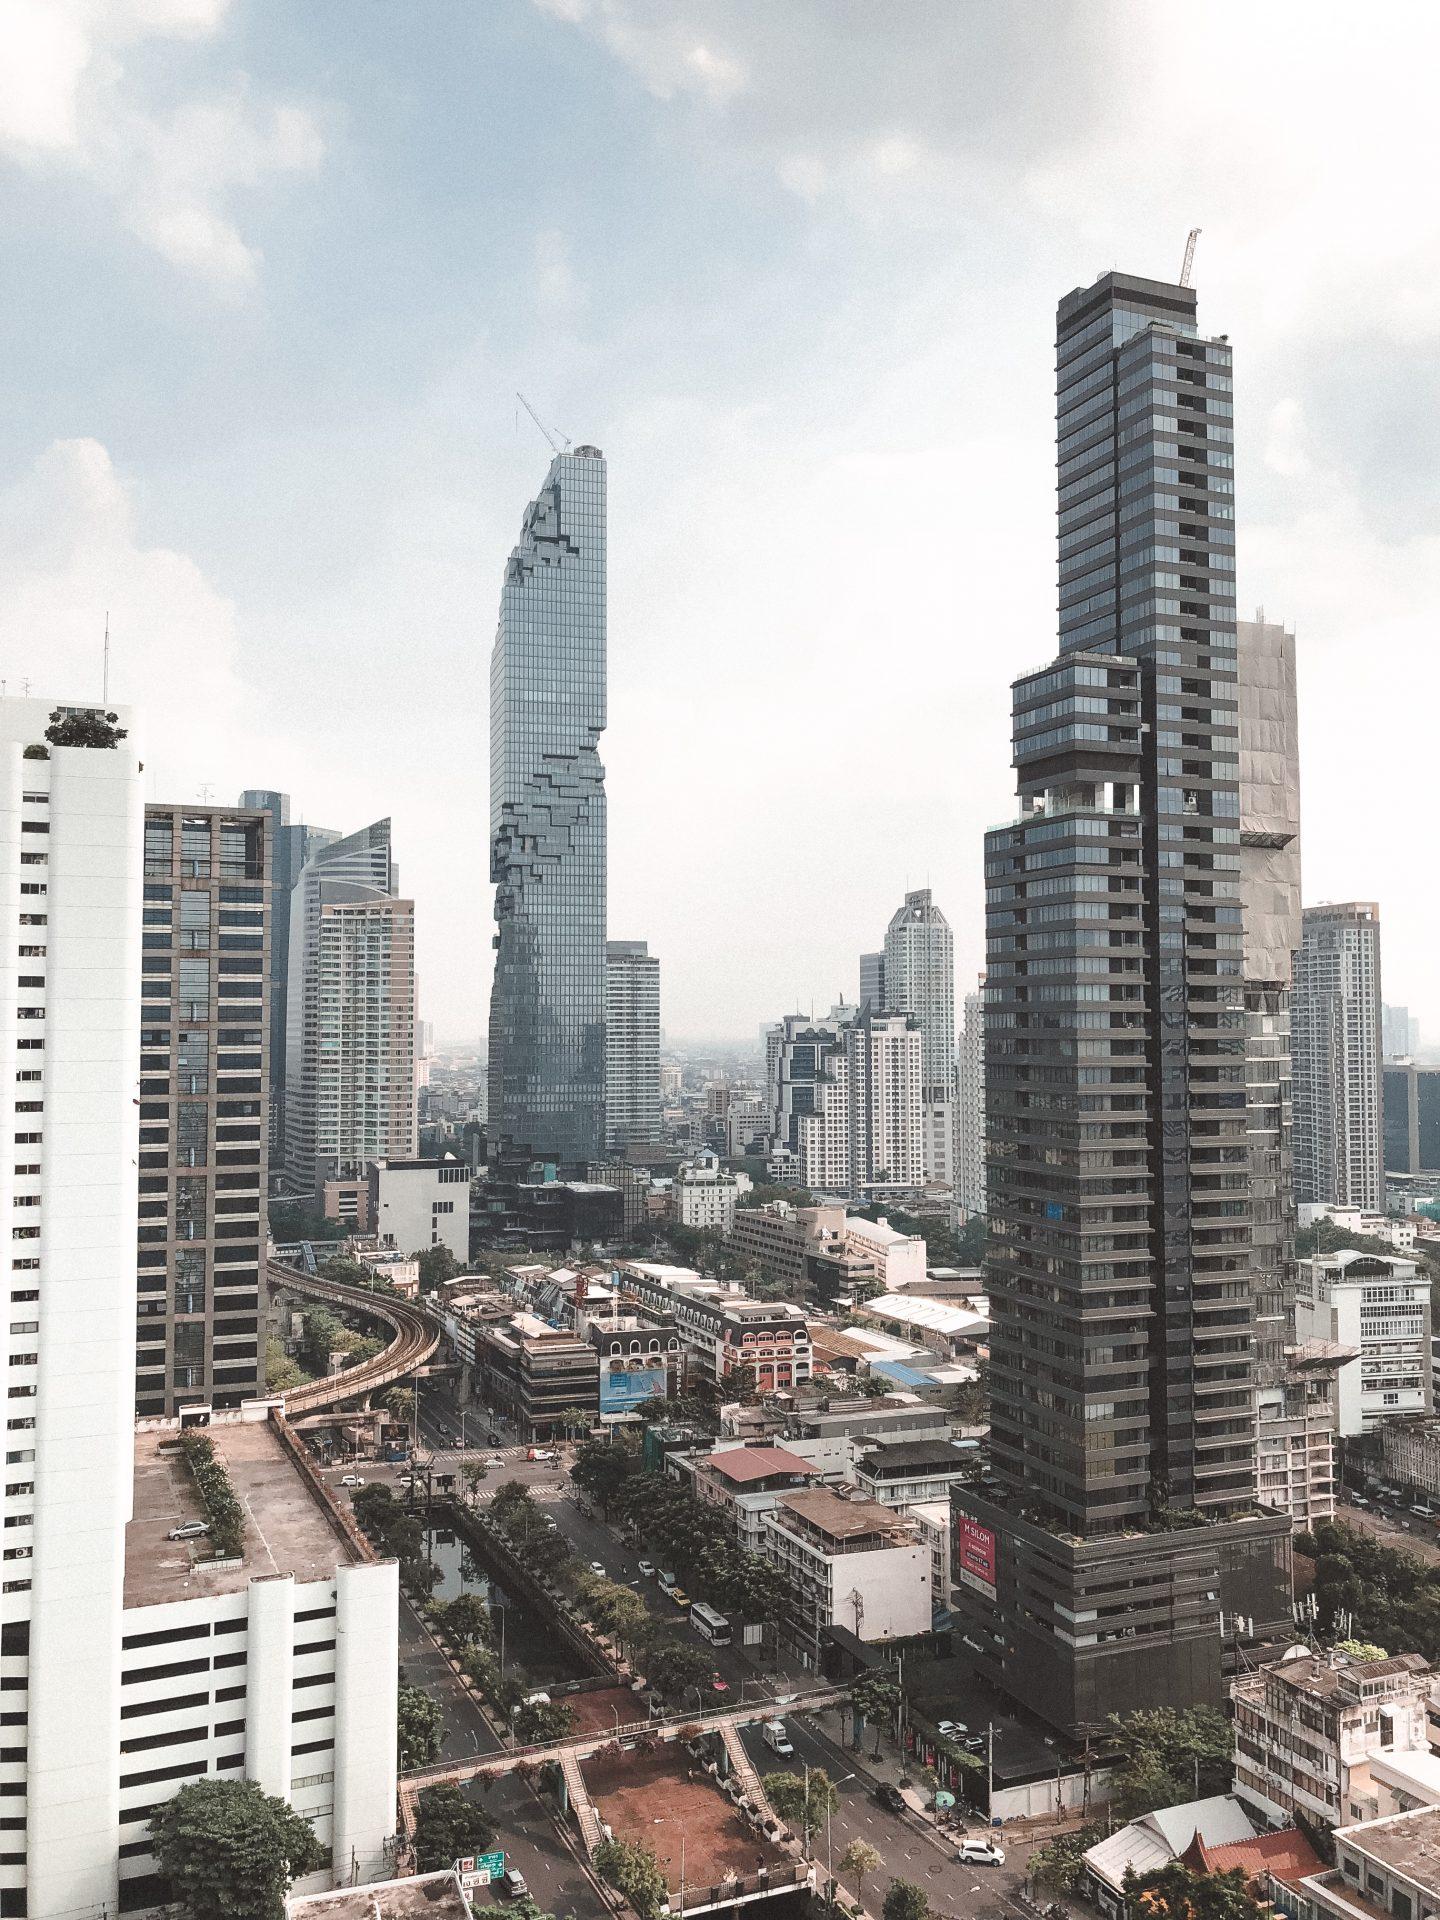 My Story About The Tuk Tuk Mafia In Bangkok